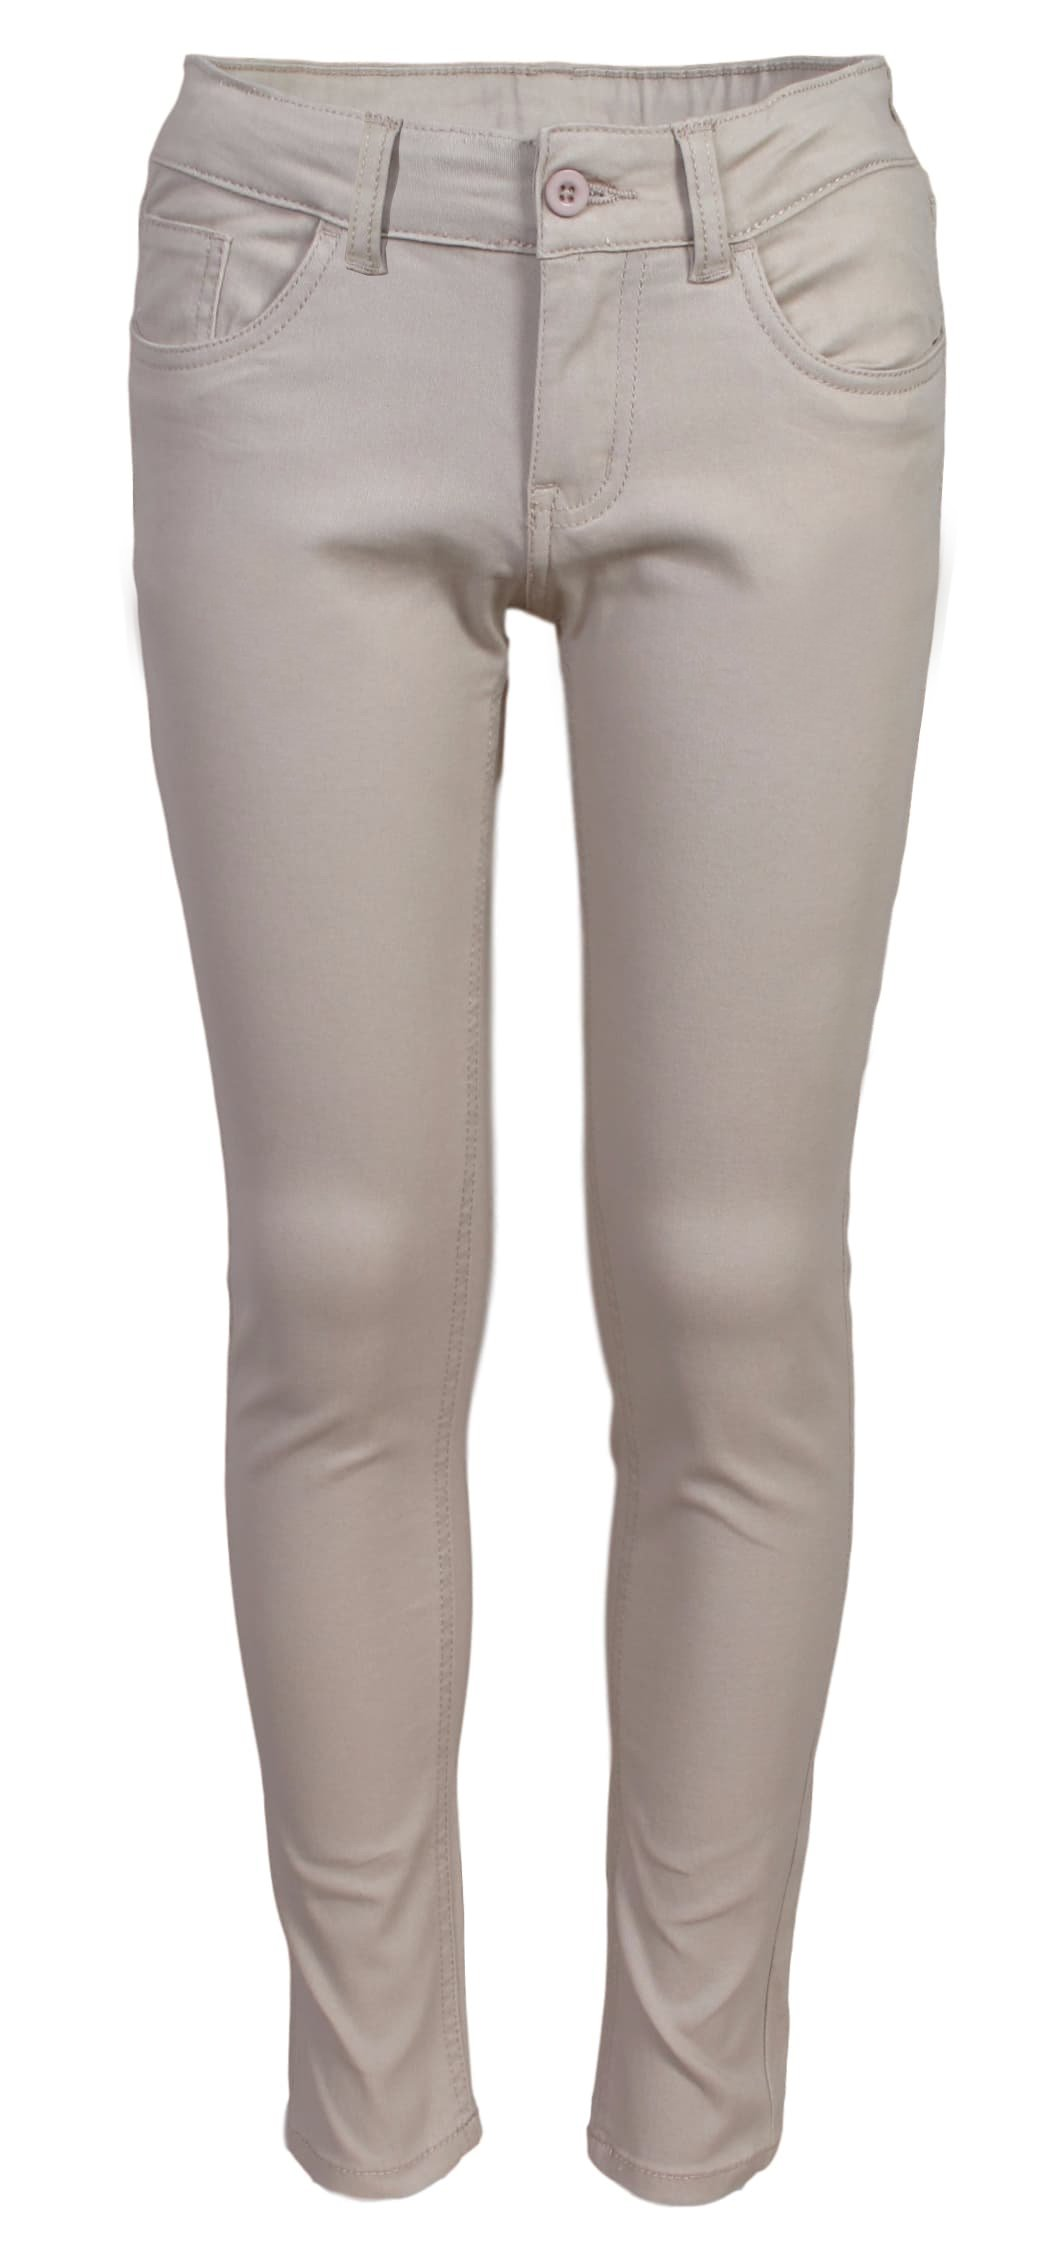 'Beverly Hills Polo Club Girls School Uniform Skinny Stretch 5 Pocket Twill Pants with Belt, Khaki, Size 14'